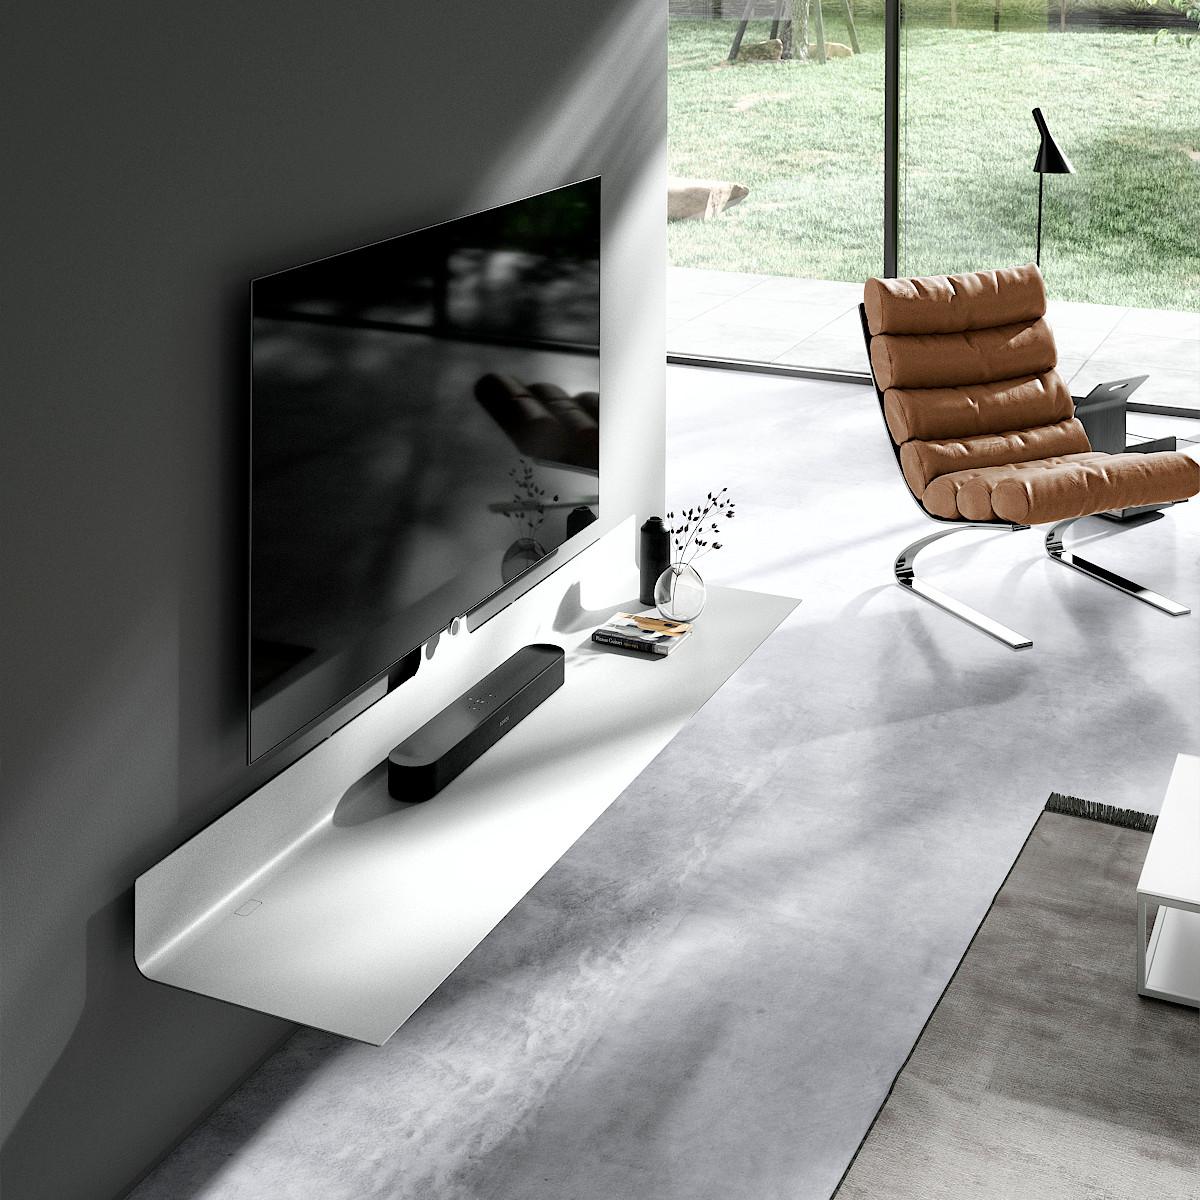 Airboard, Lowboard, Spectral TV Möbel